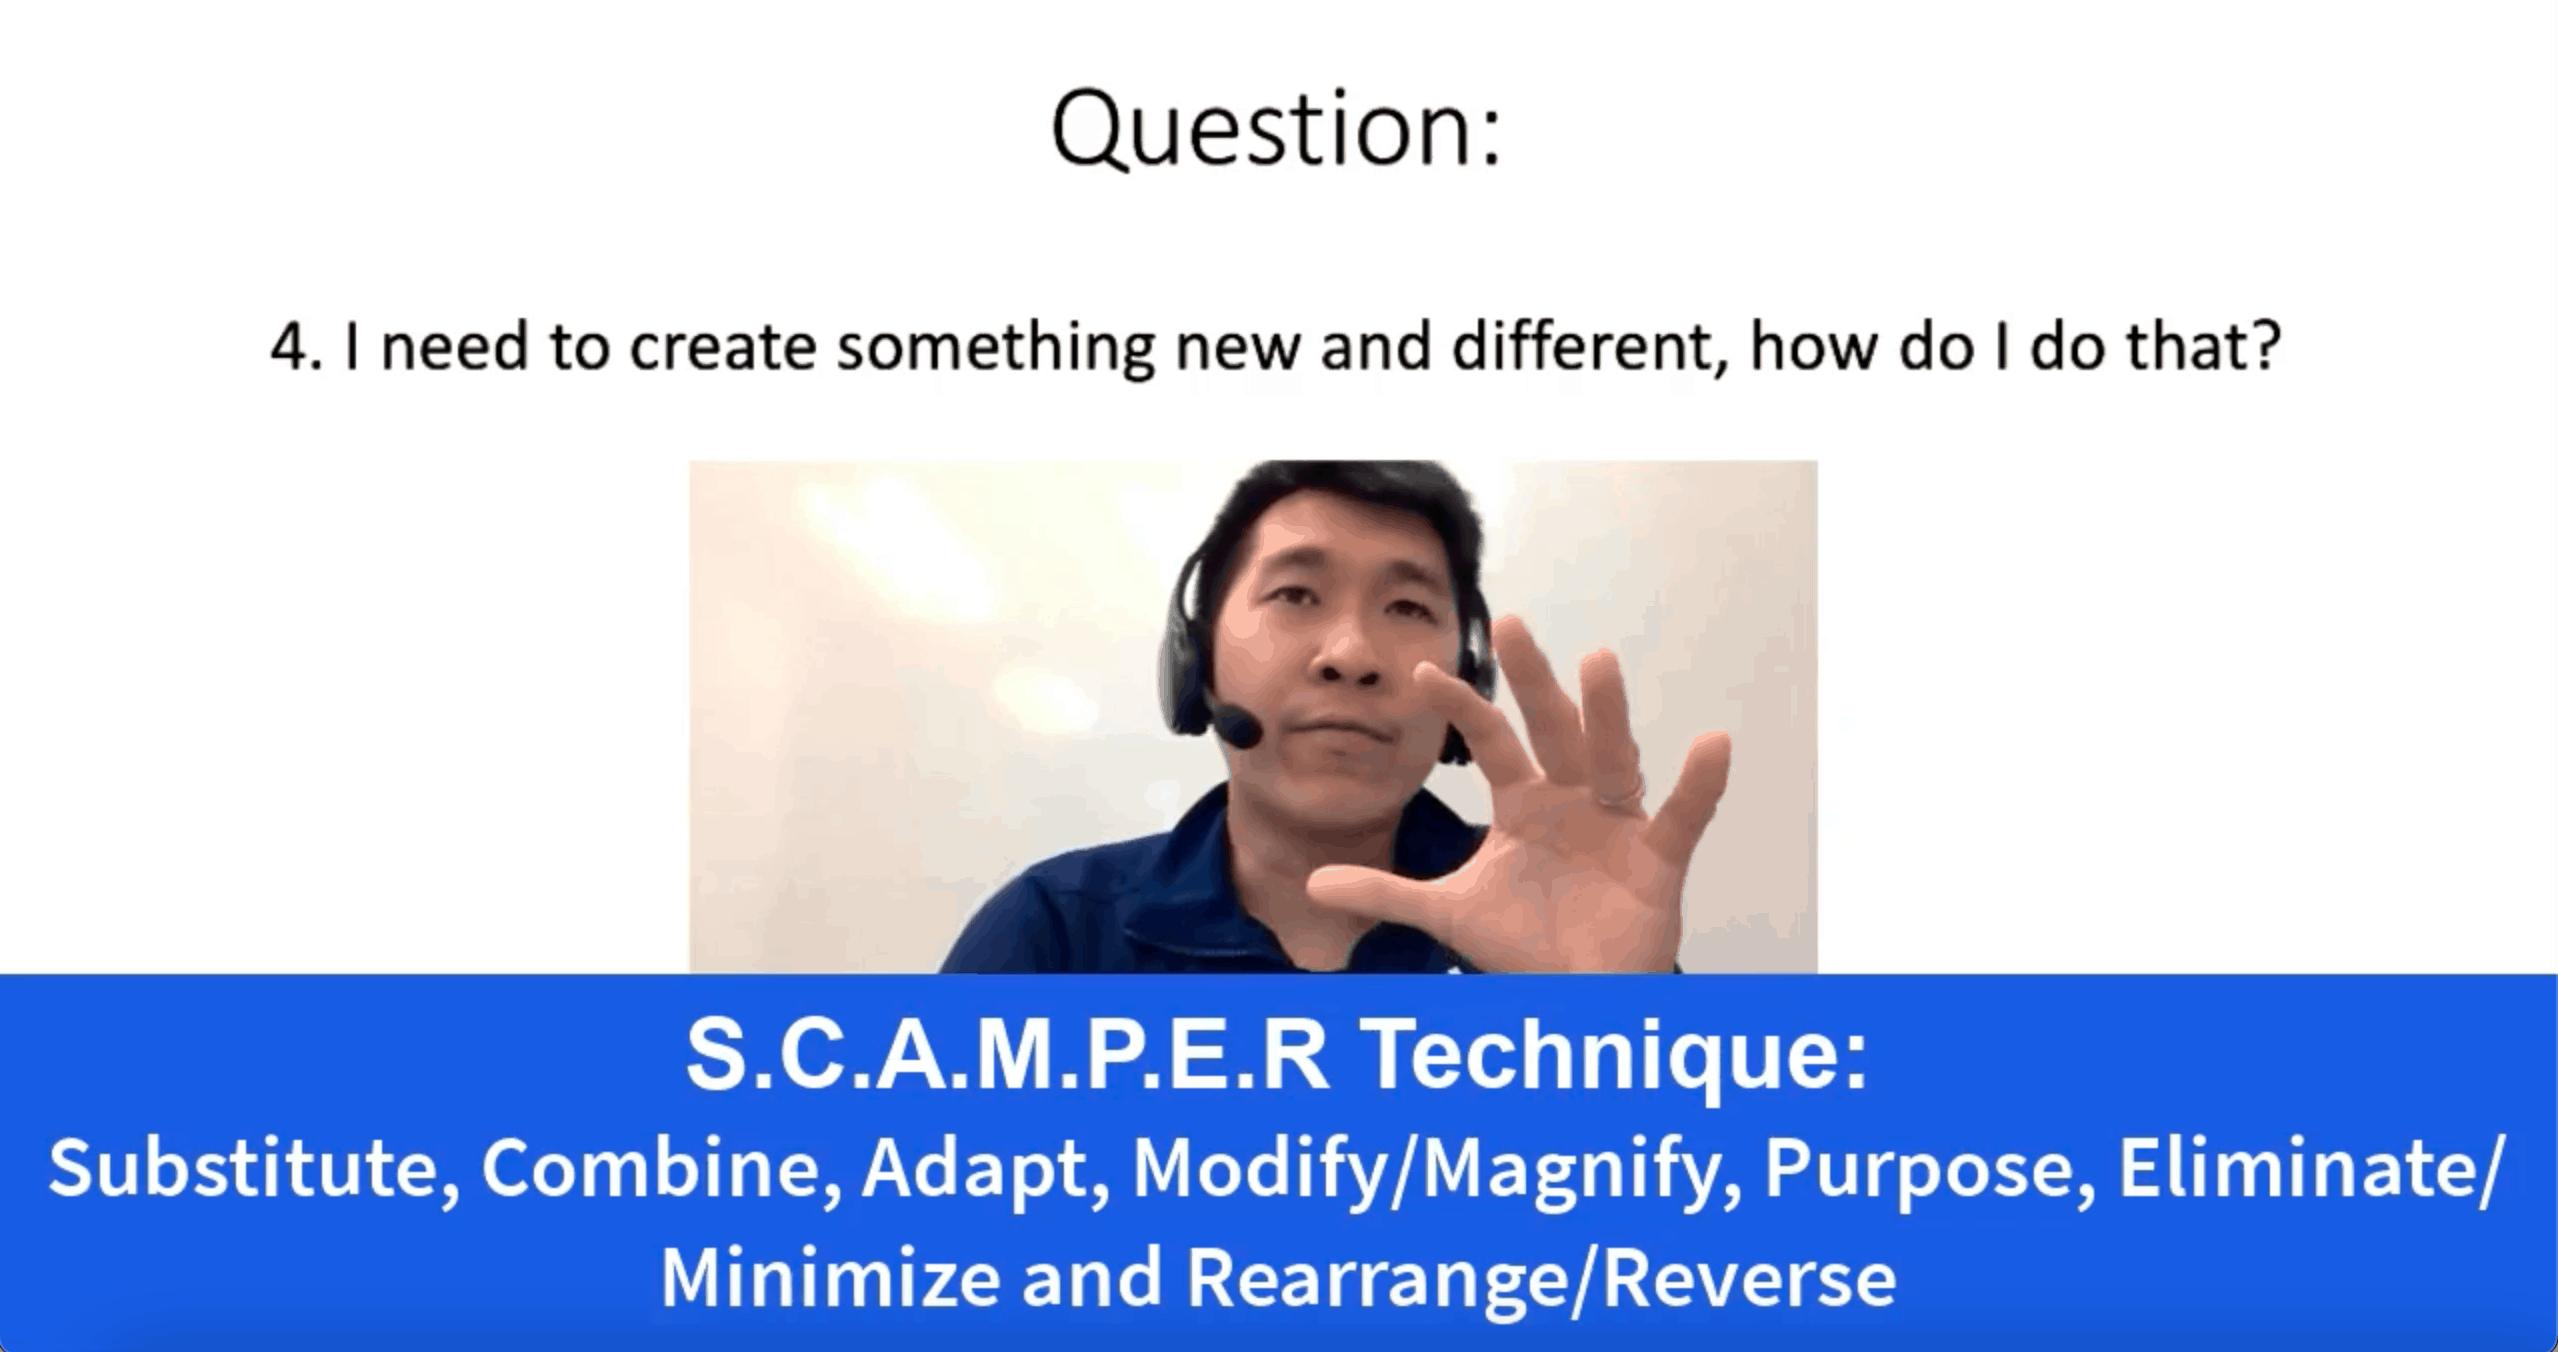 SCAMPER_TECHNIQUE